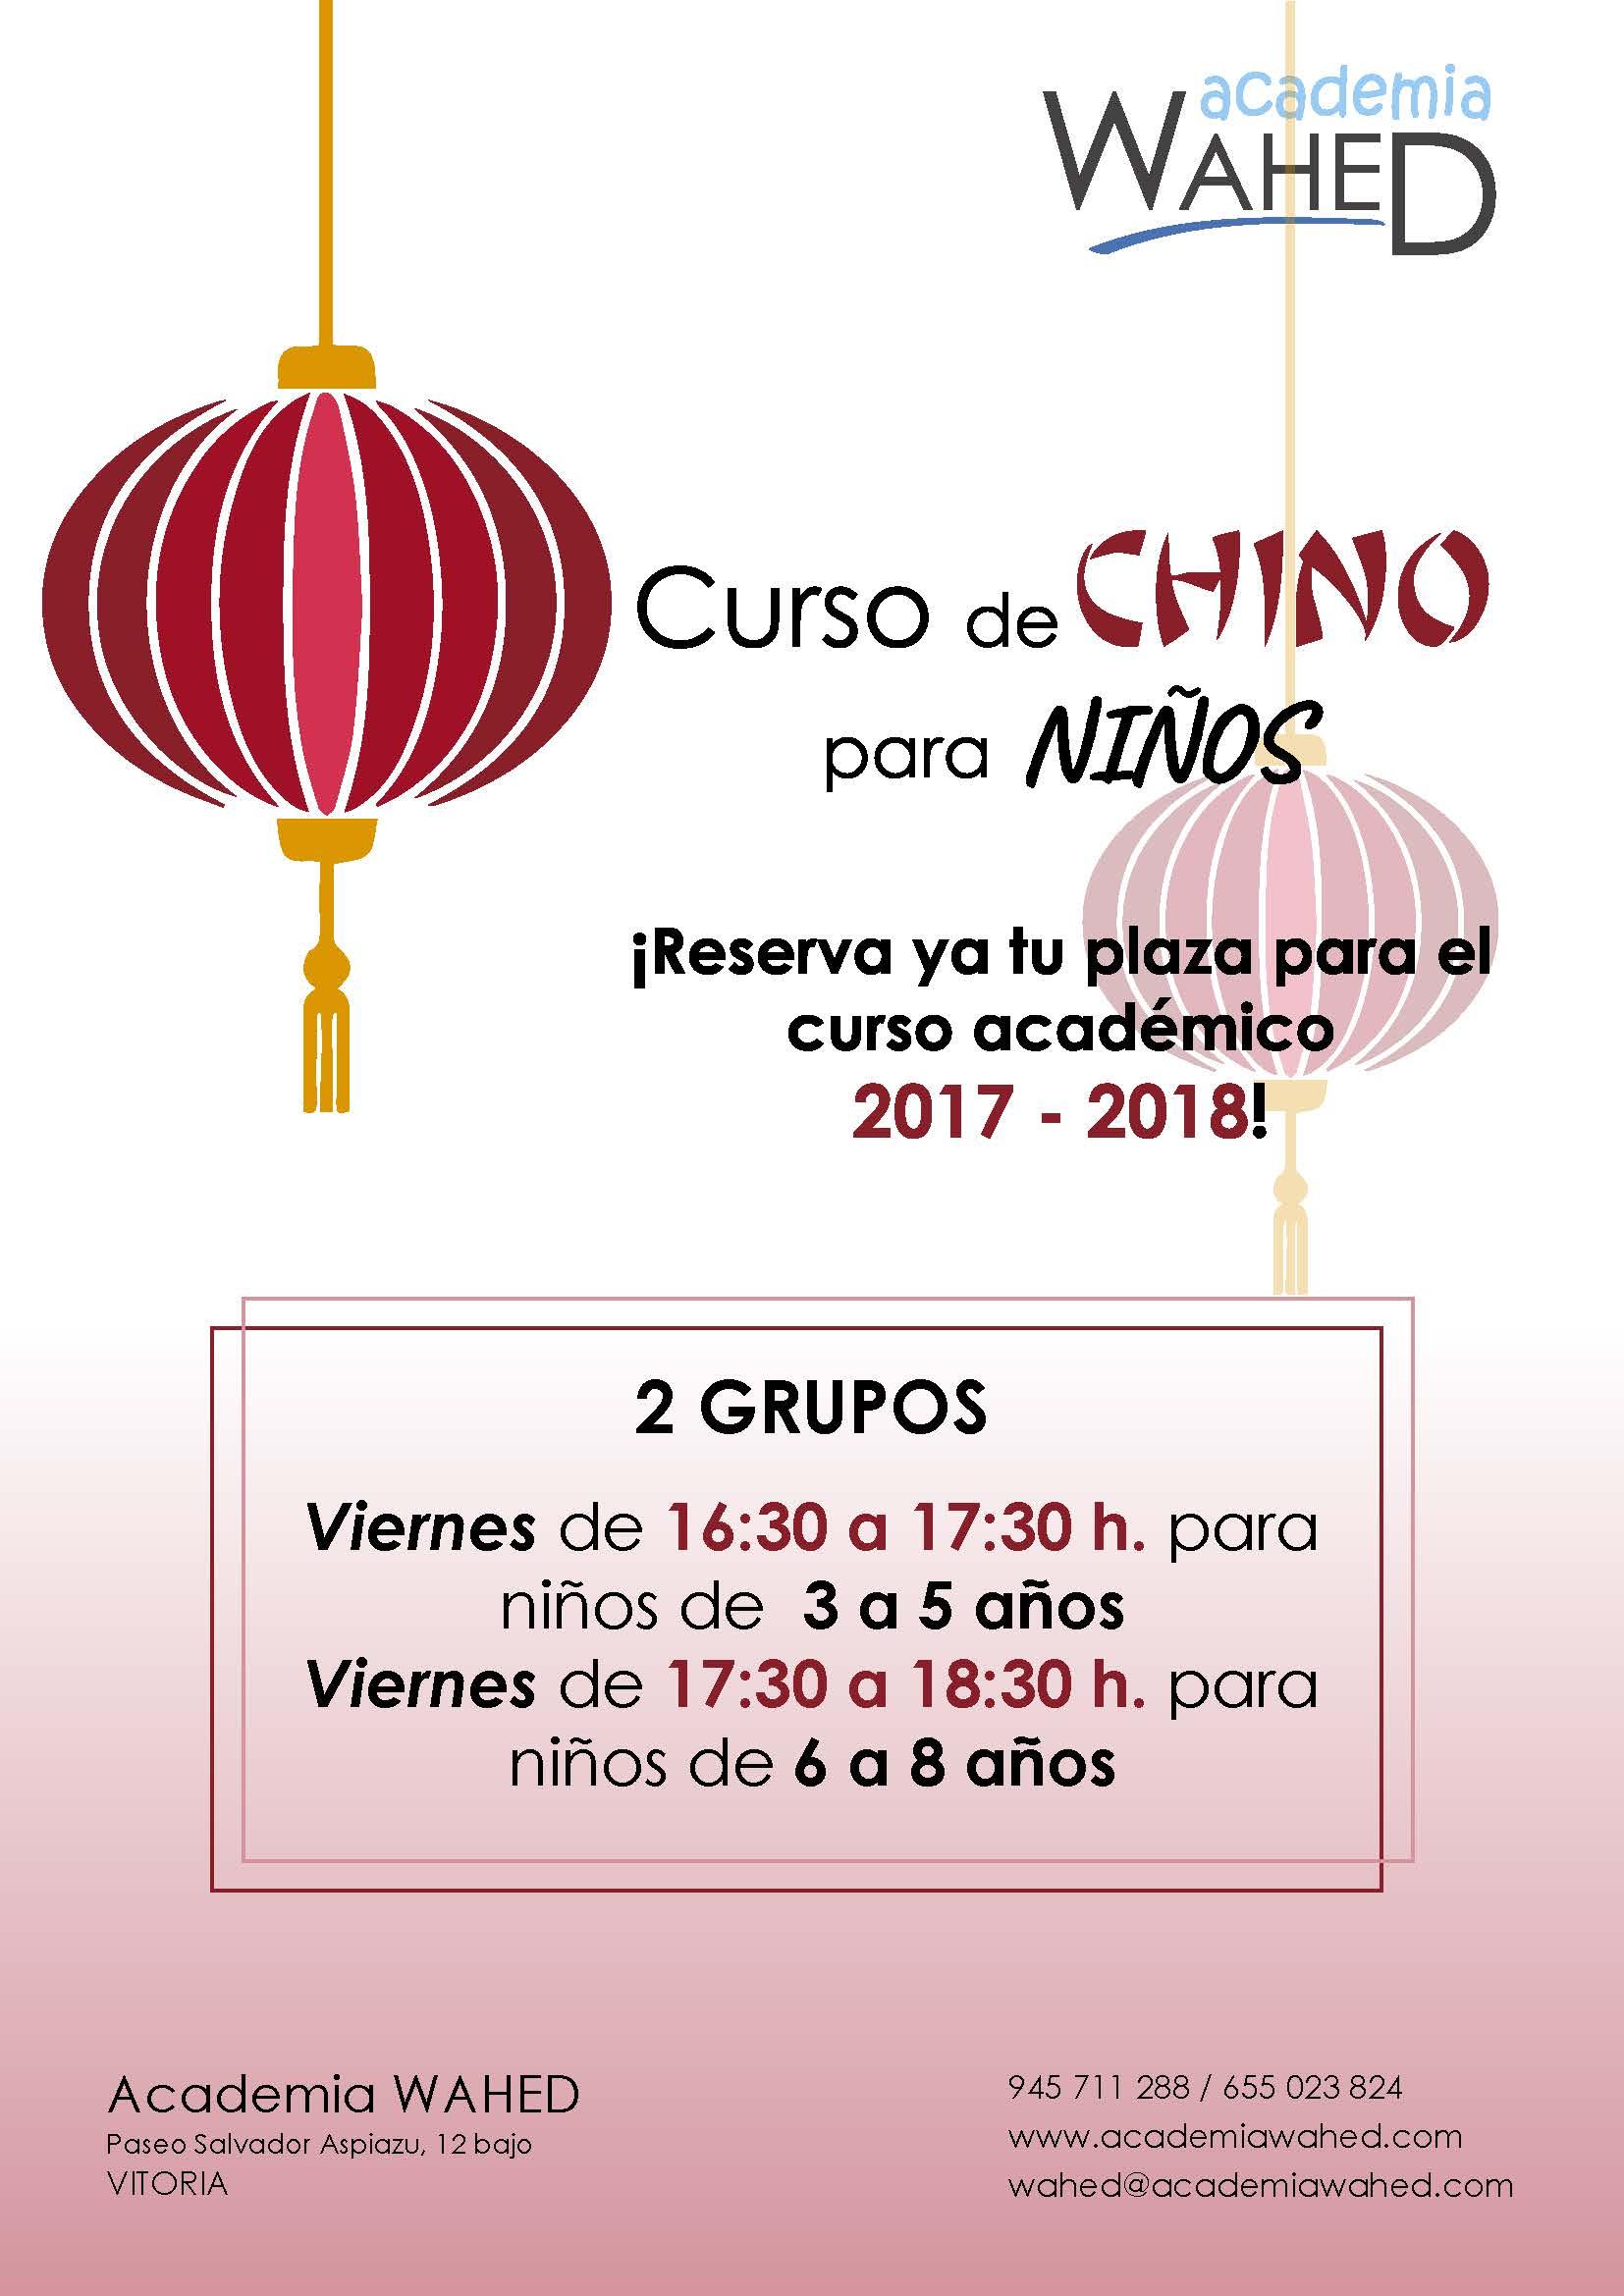 Wahed_curso chino_agosto17